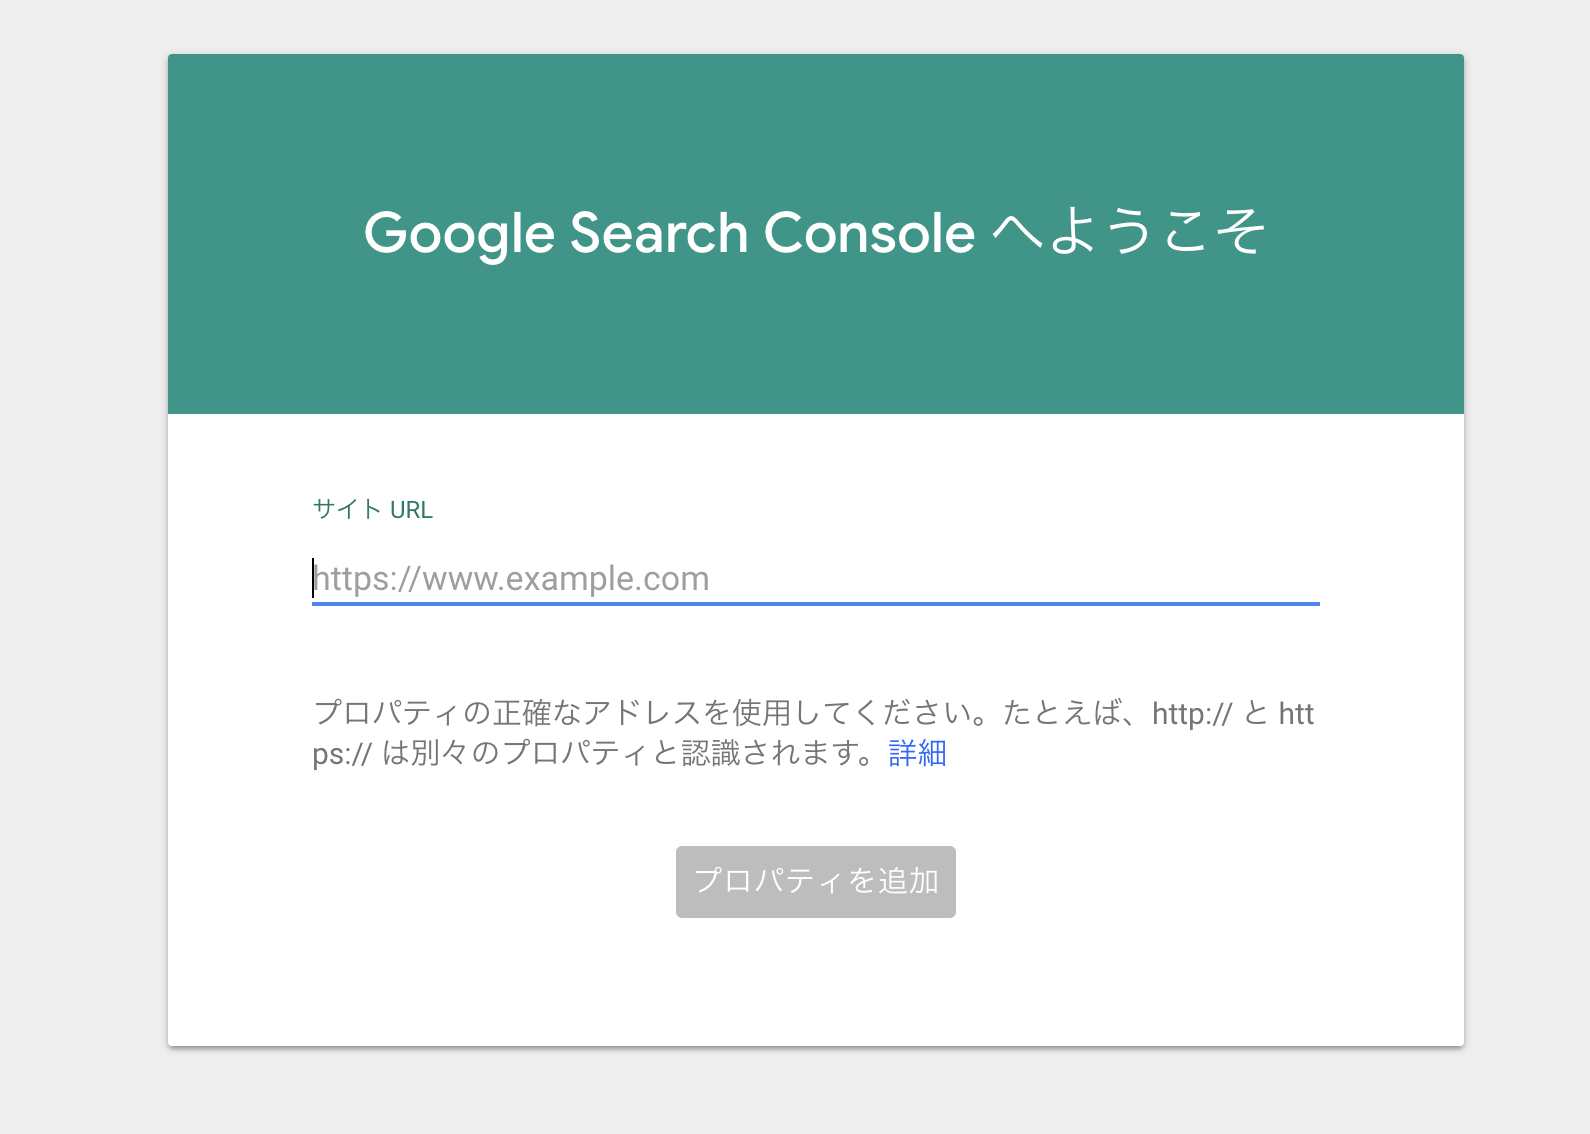 Google Search Consoleのイメージ